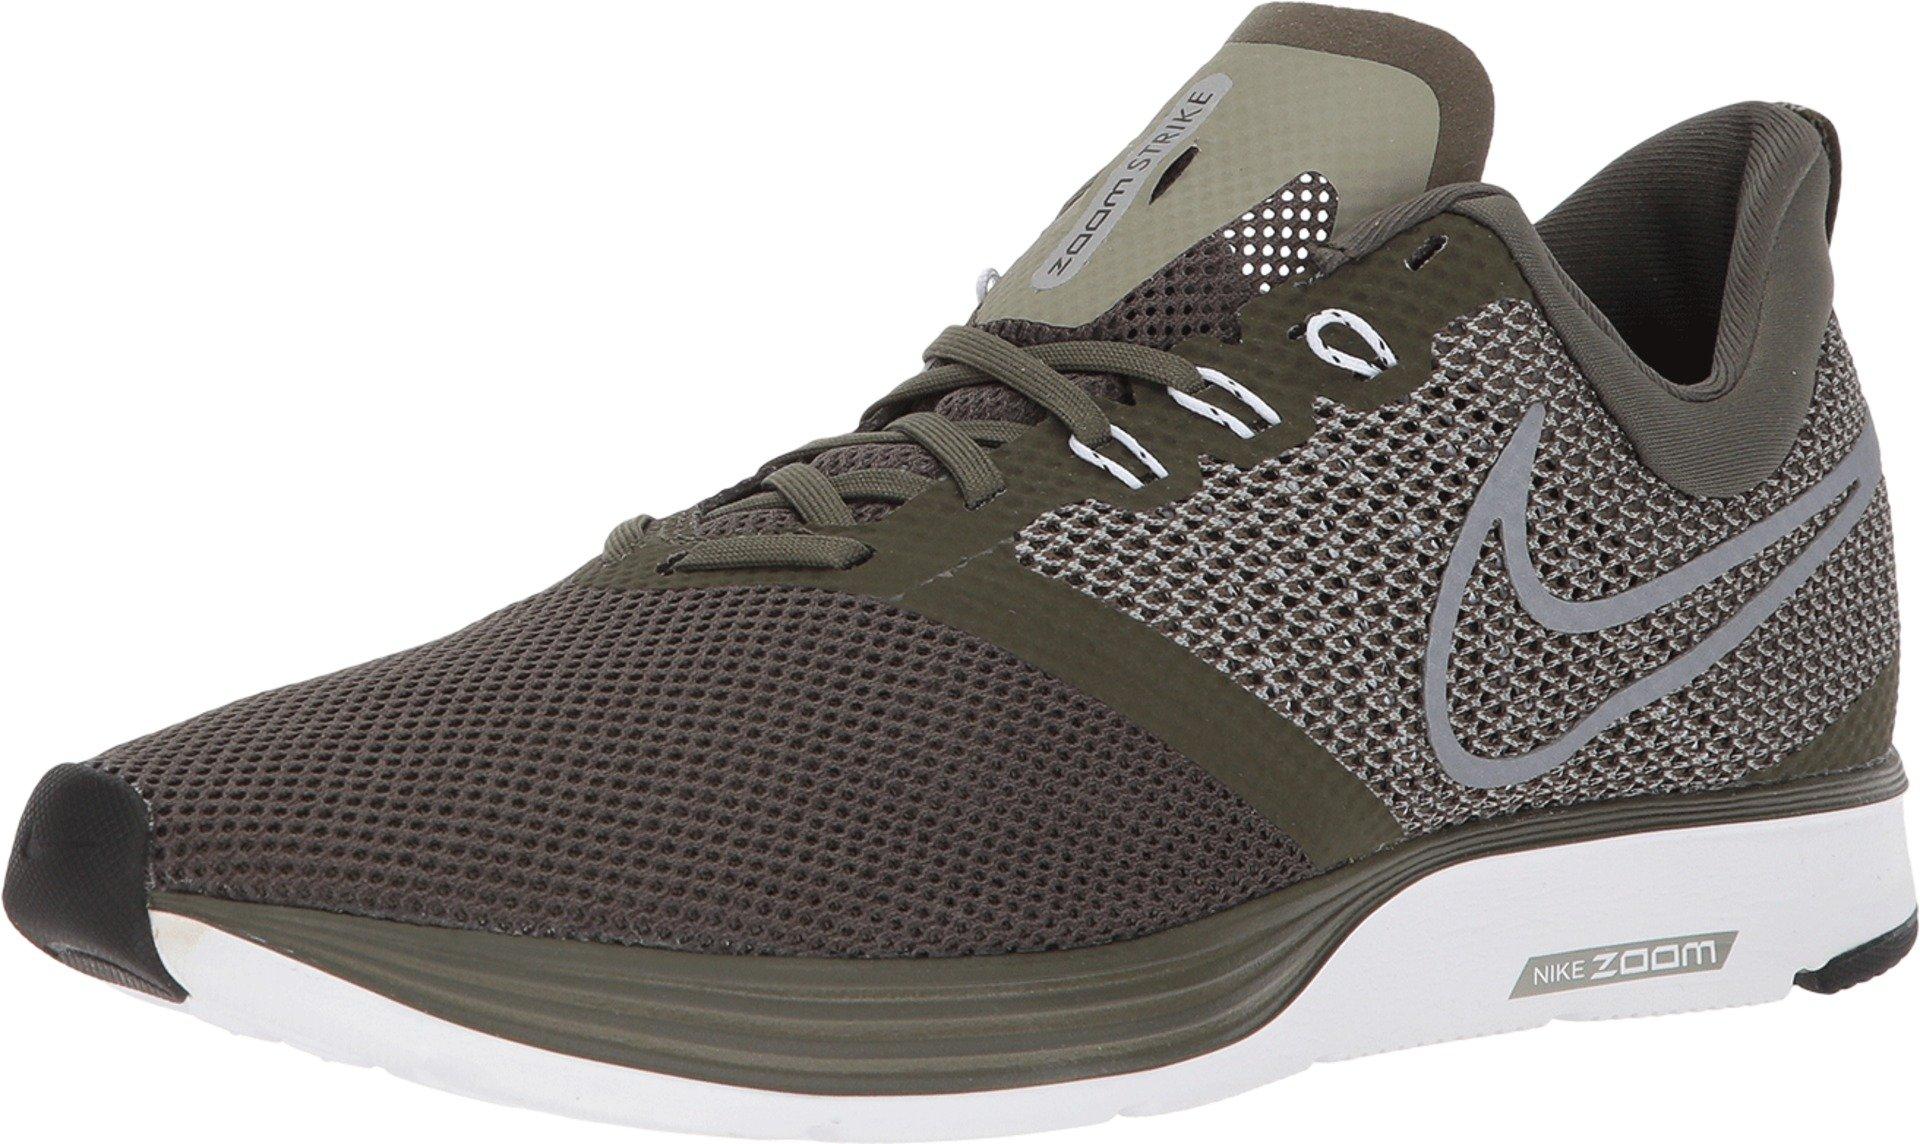 b359a924bf50b Nike Zoom Strike Men's Running Shoes, Green, Size 10 D(M) US